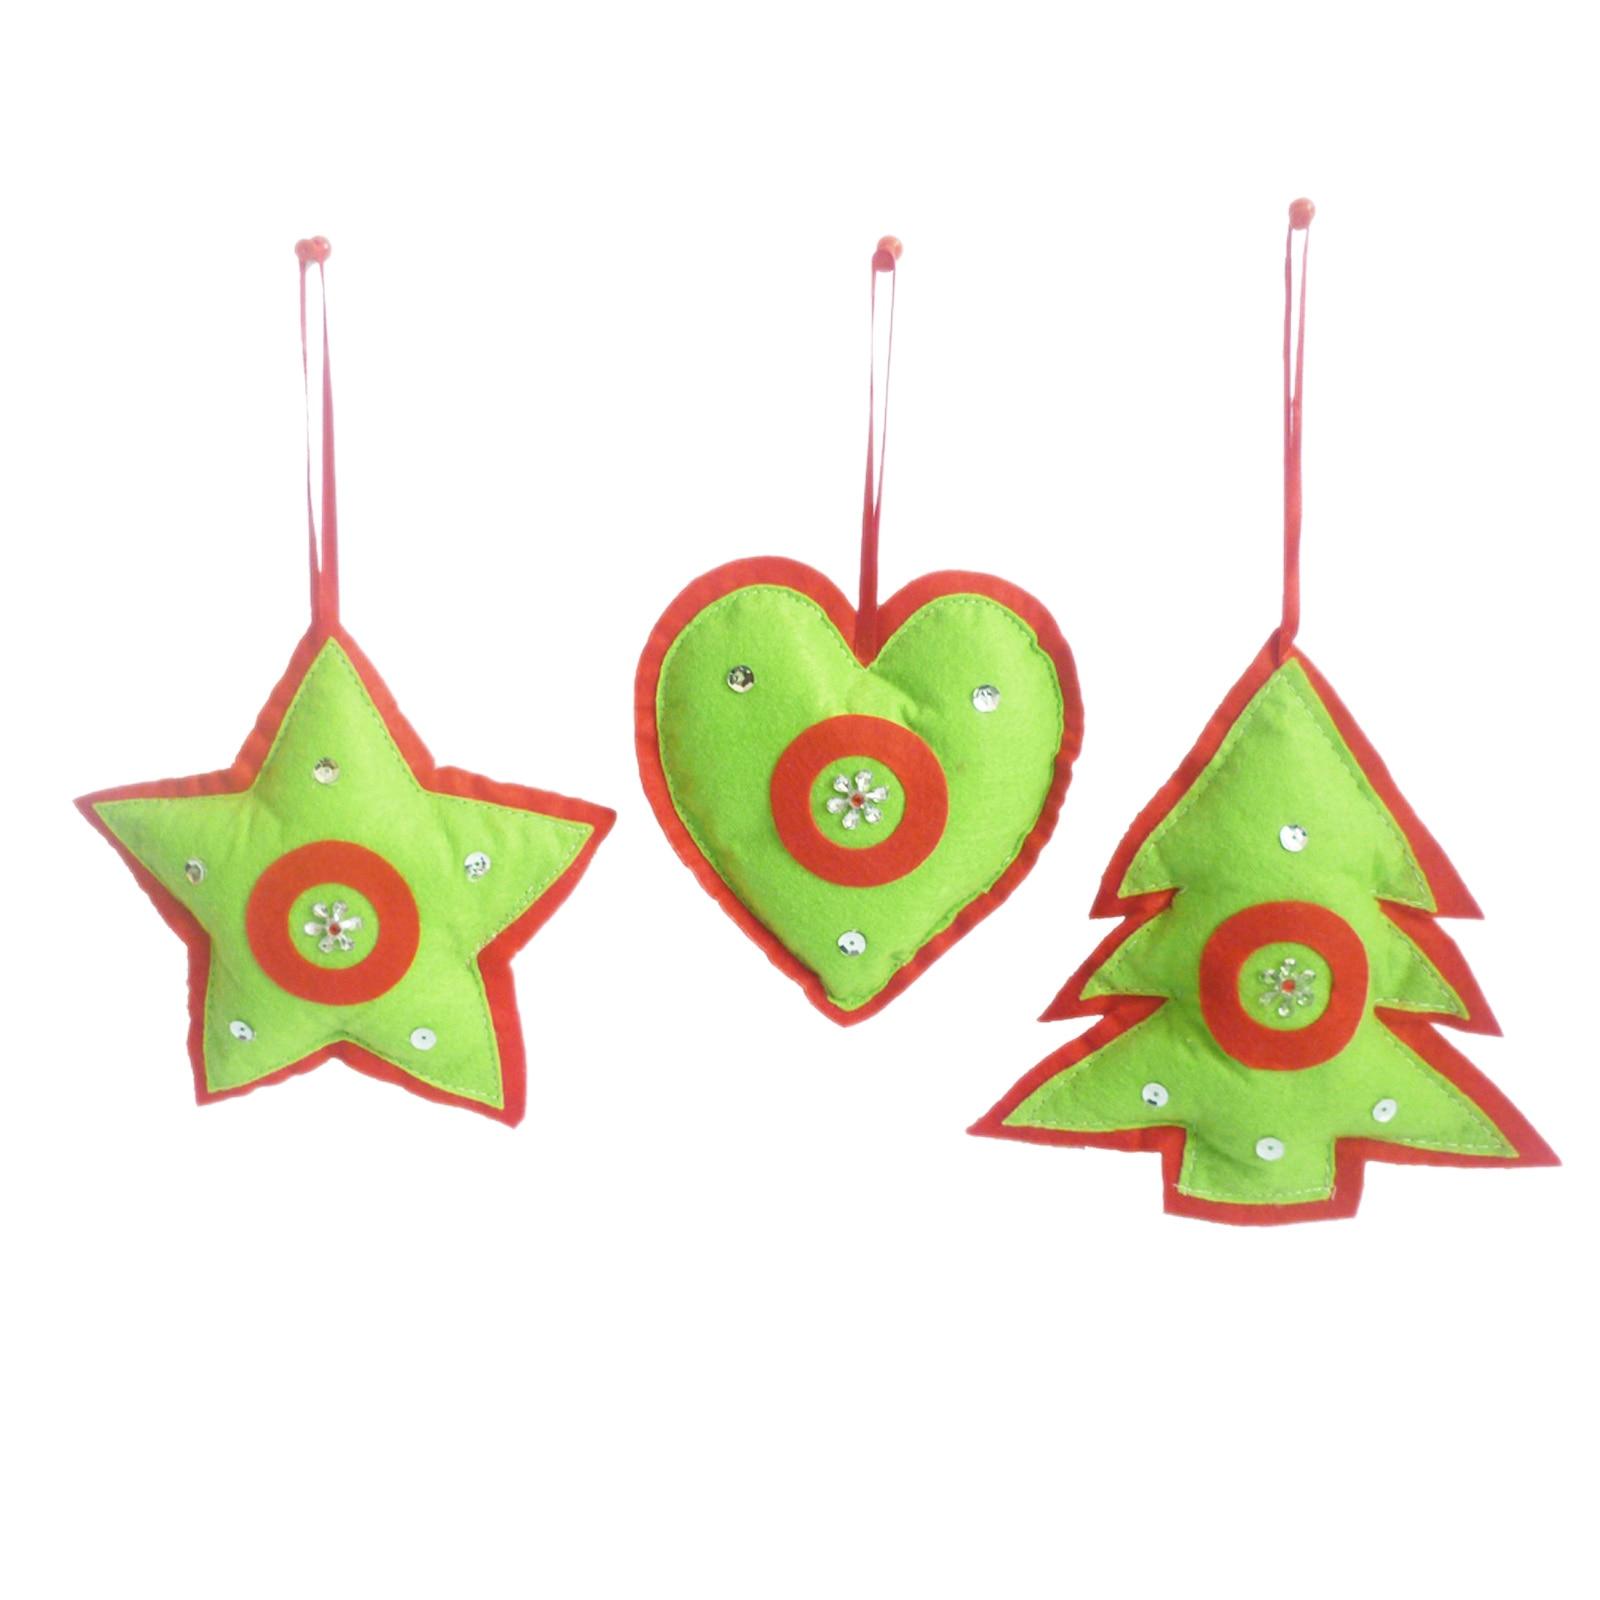 1pcs New Year Christmas Tree Pendants Felt Merry Christmas